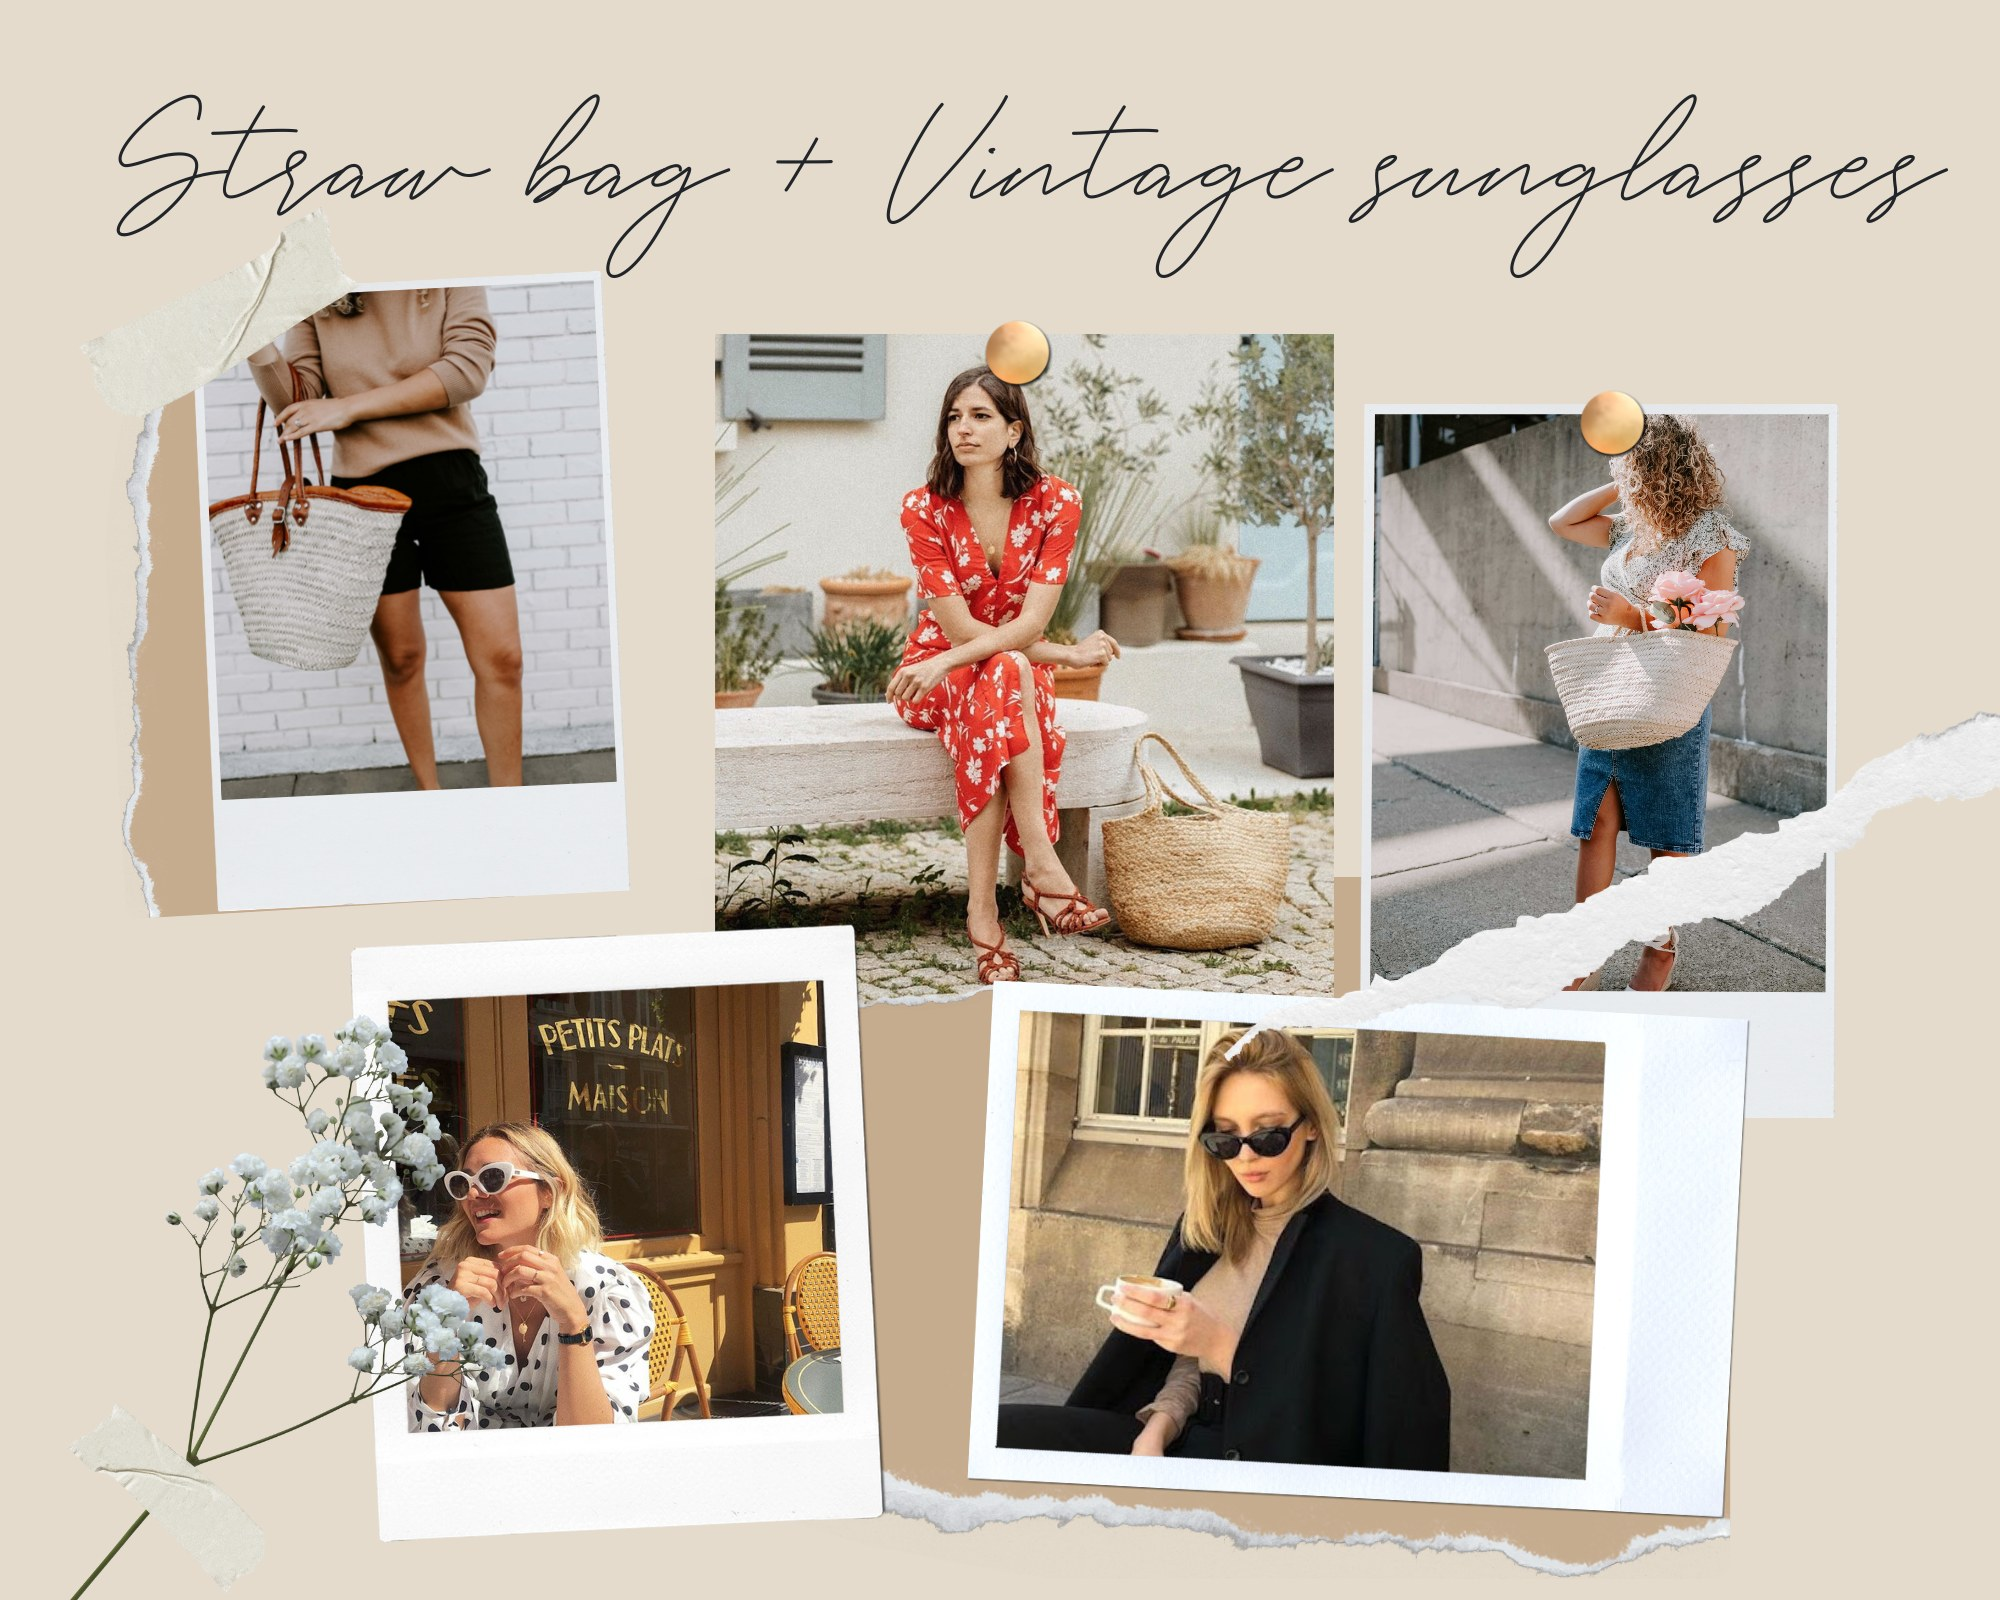 Straw bag + Vintage sunglasses